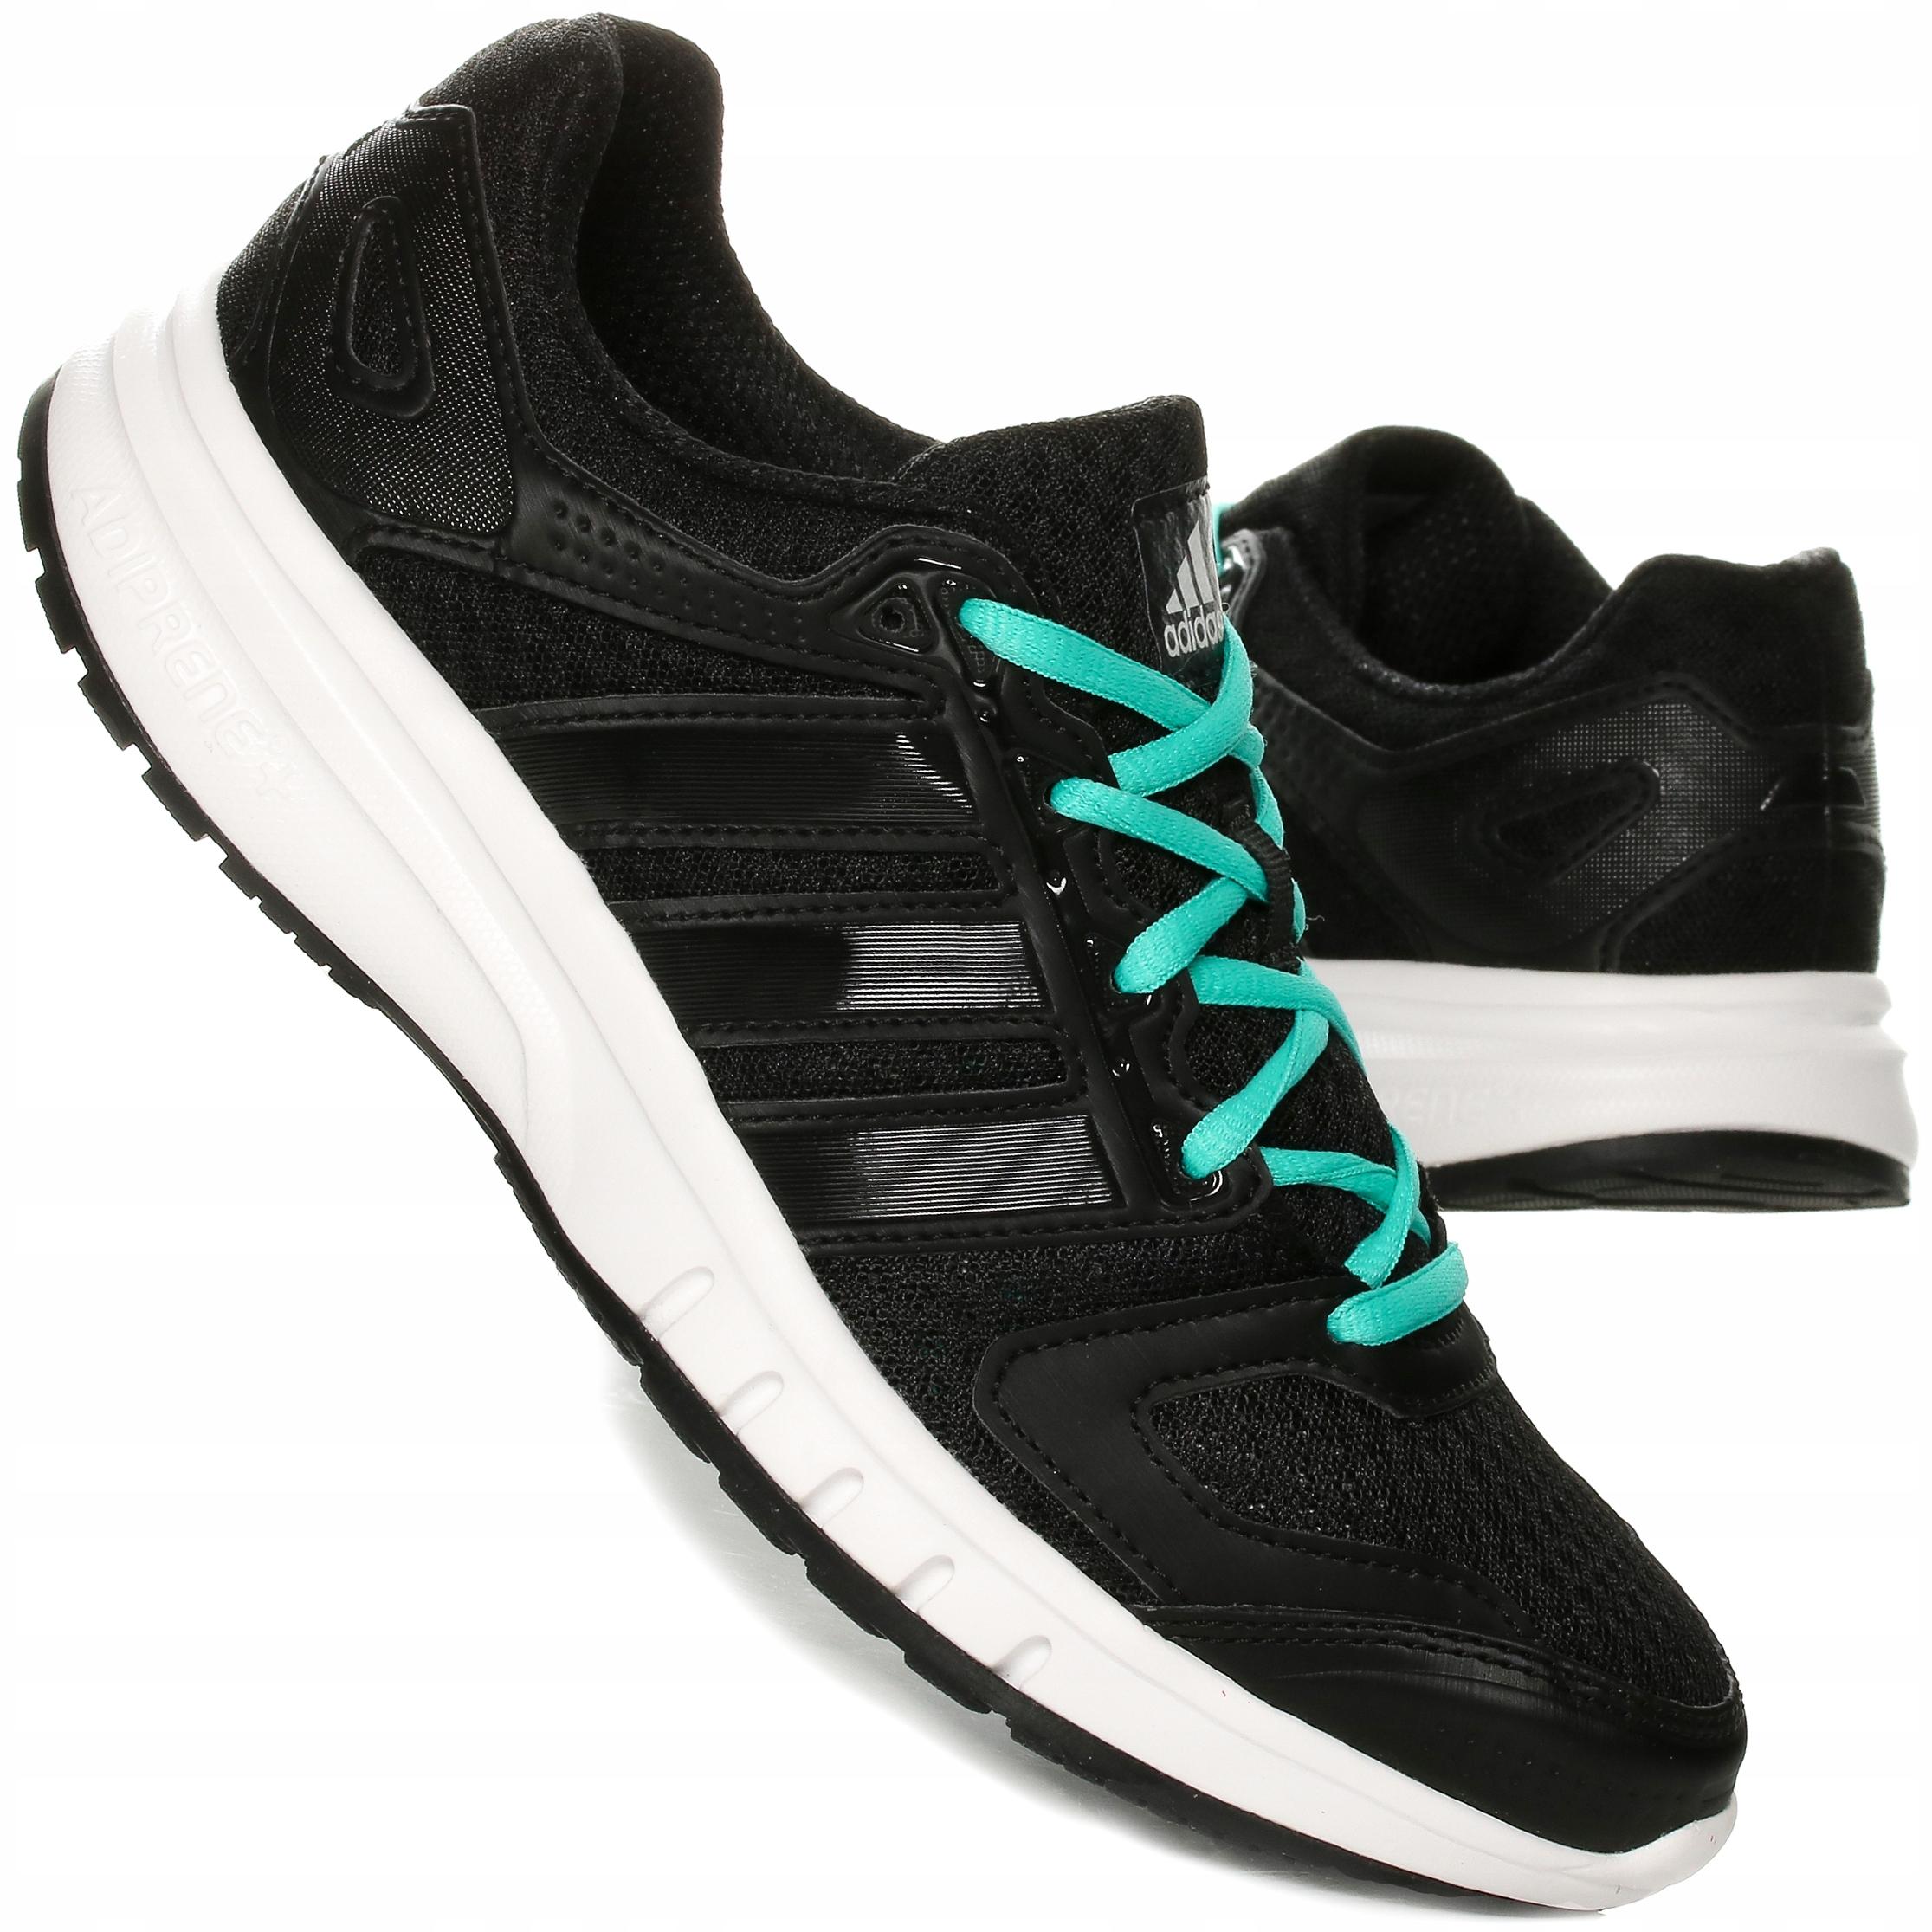 Buty damskie do biegania Adidas Galaxy r.40